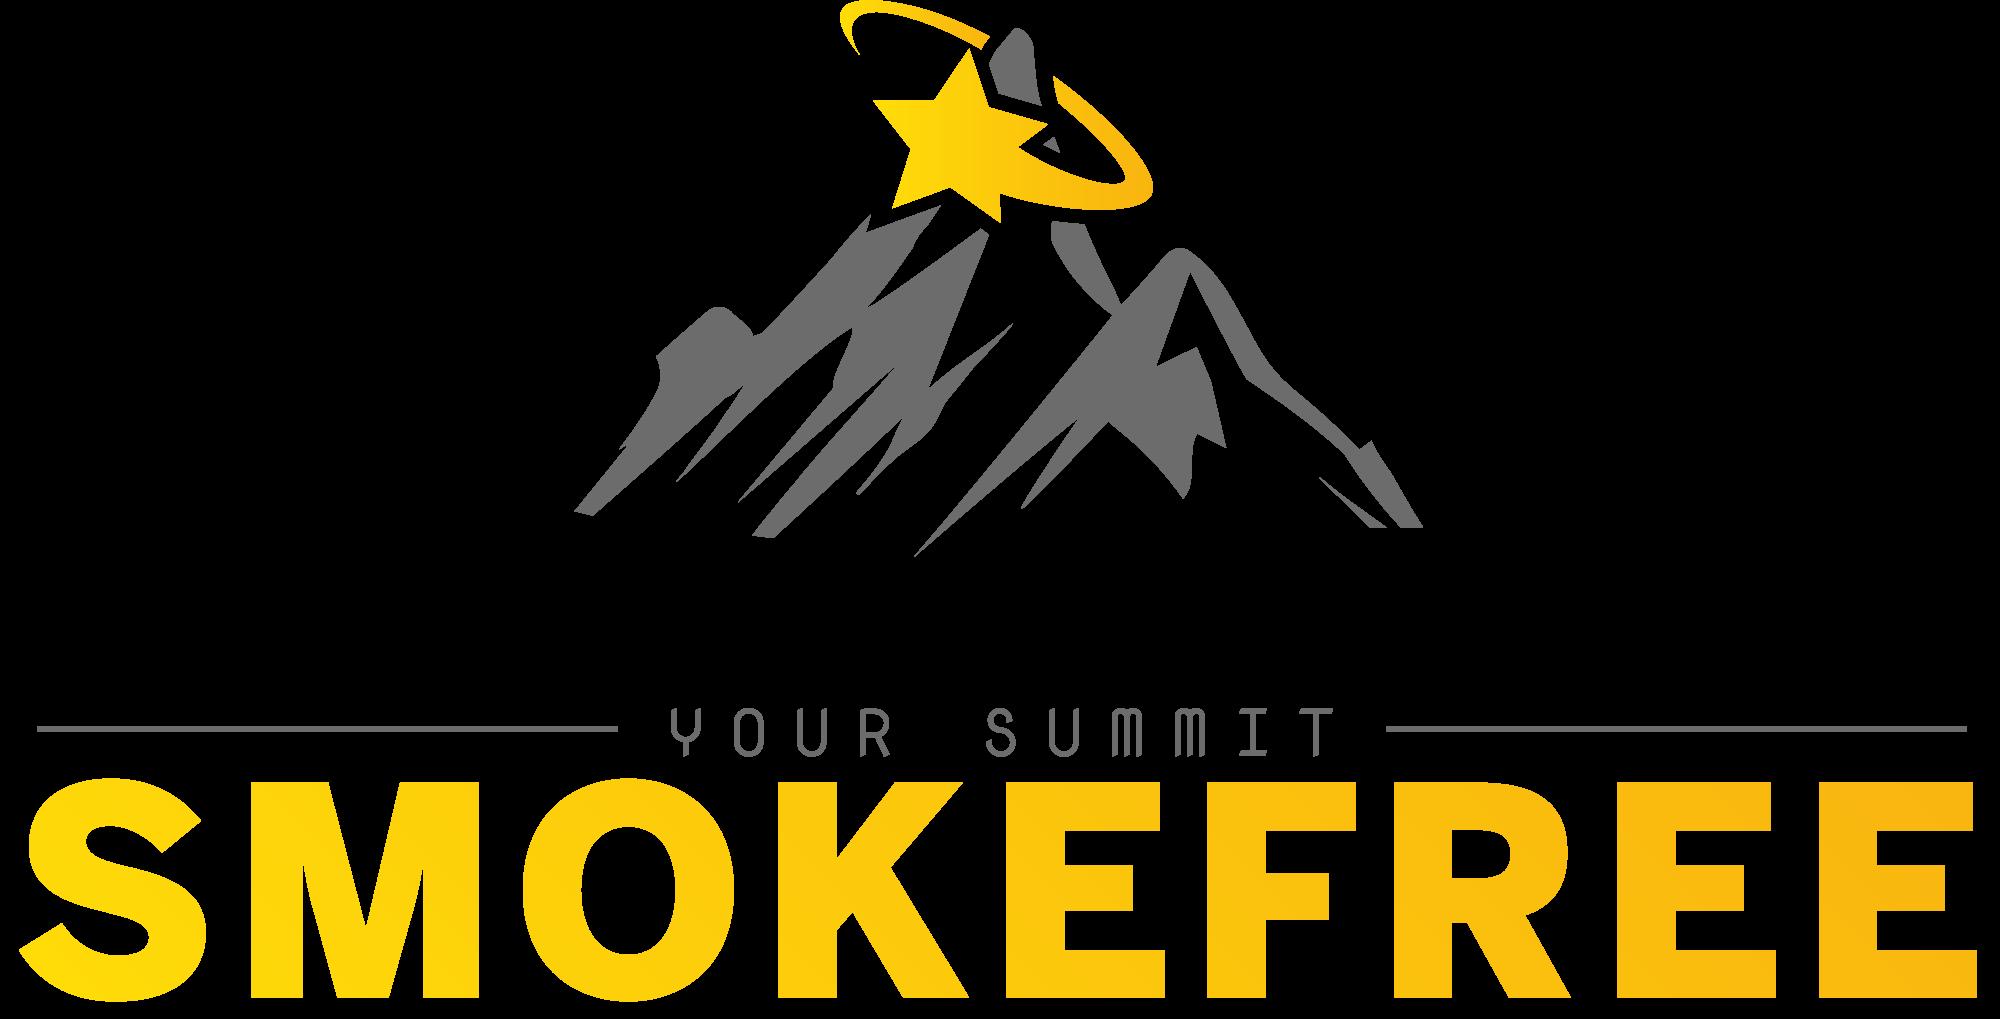 Your Summit| SMOKEFREE